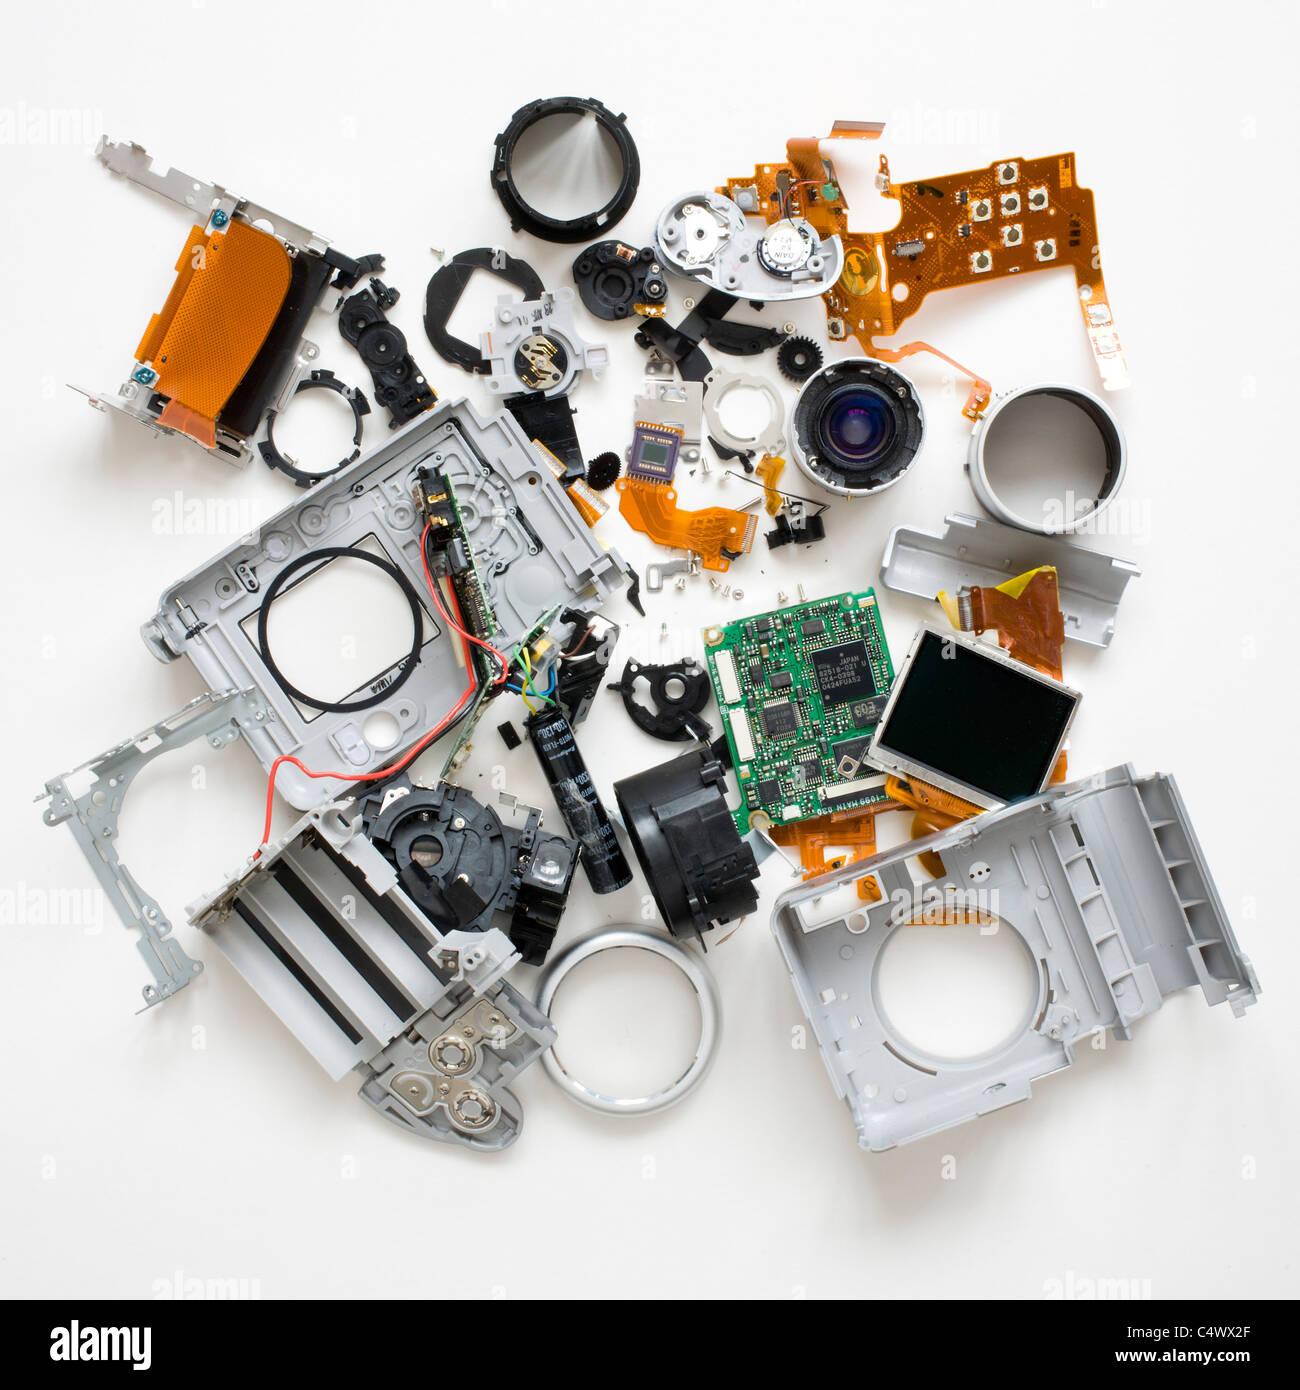 Disassembled broken compact camera - Stock Image